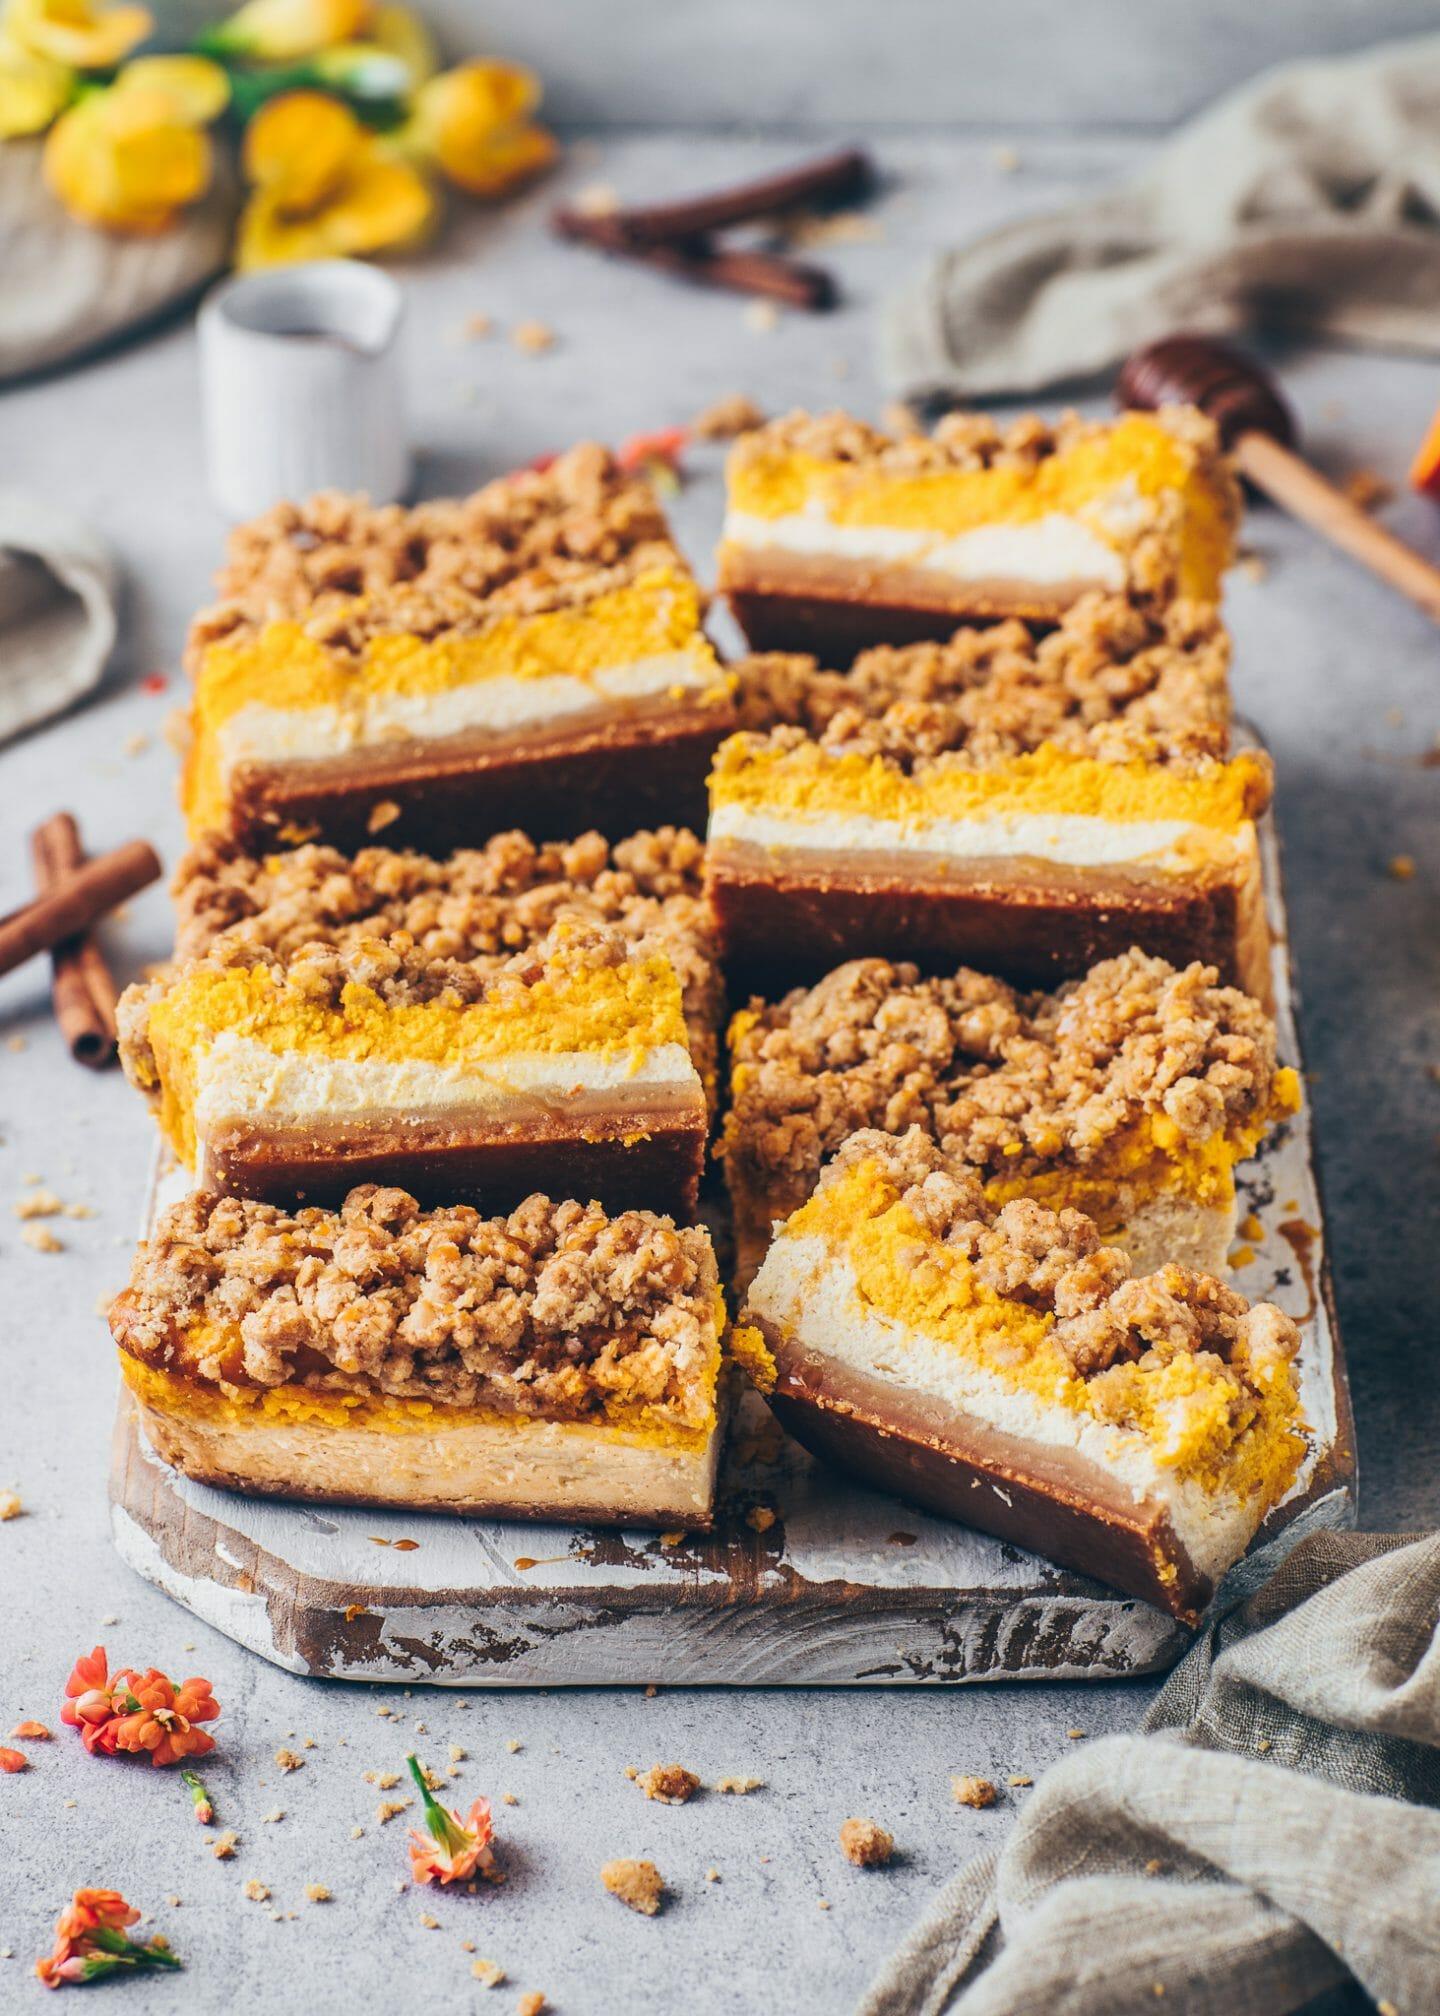 Pumpkin Cheesecake Bars with Cinnamon Streusel